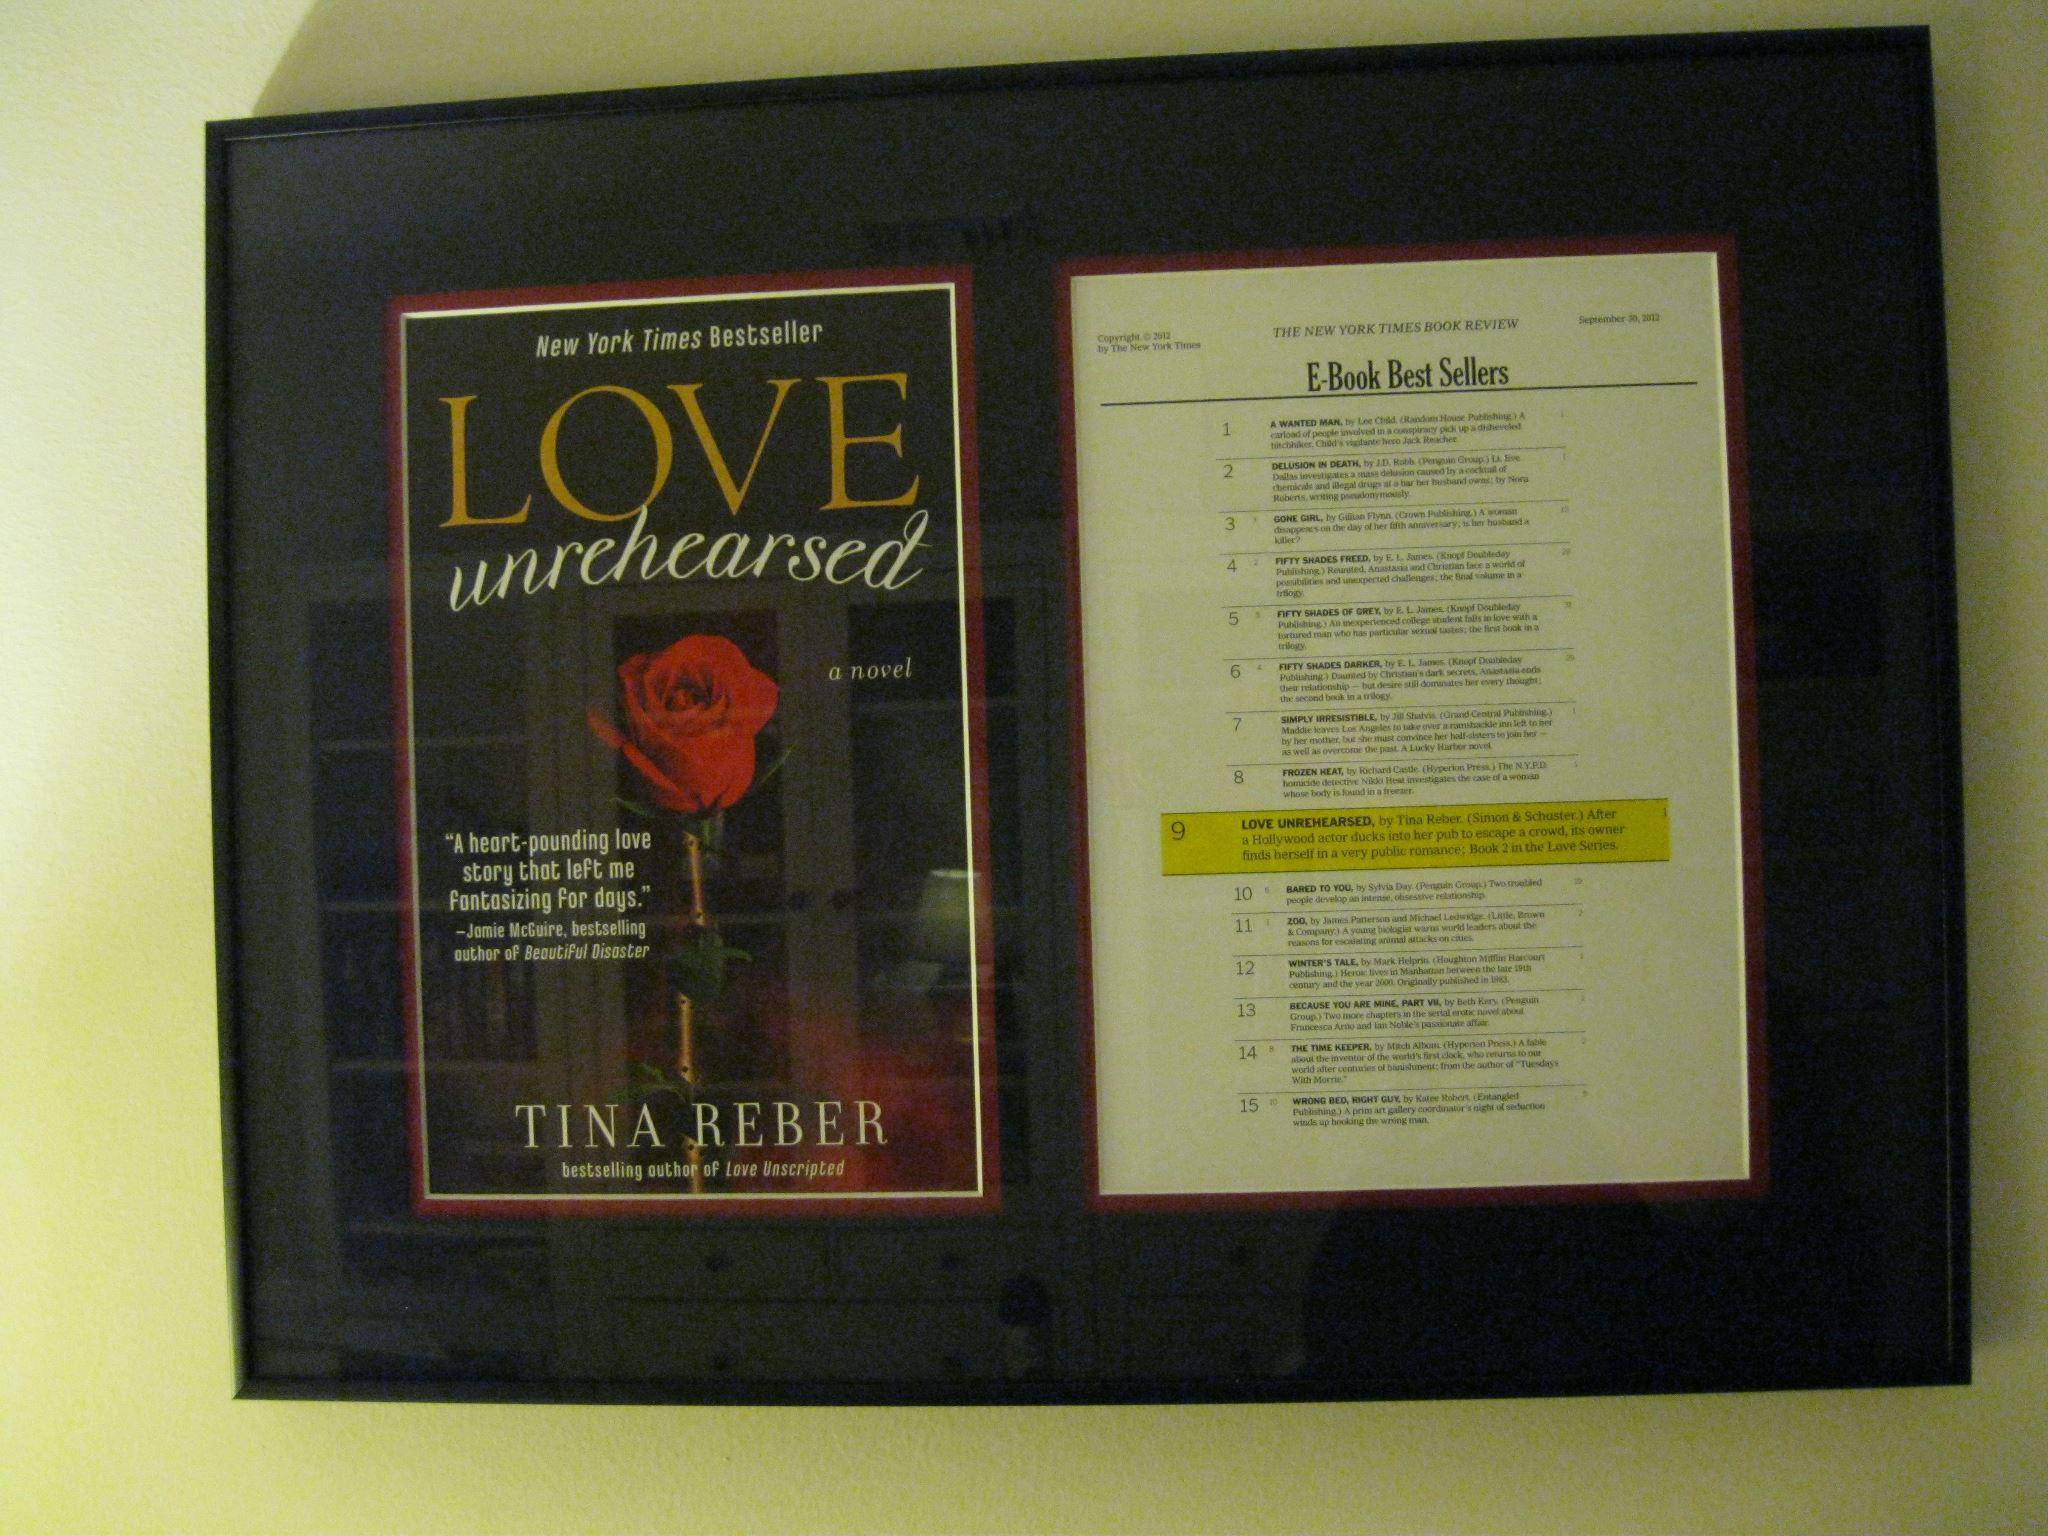 Pdf unscripted reber tina love